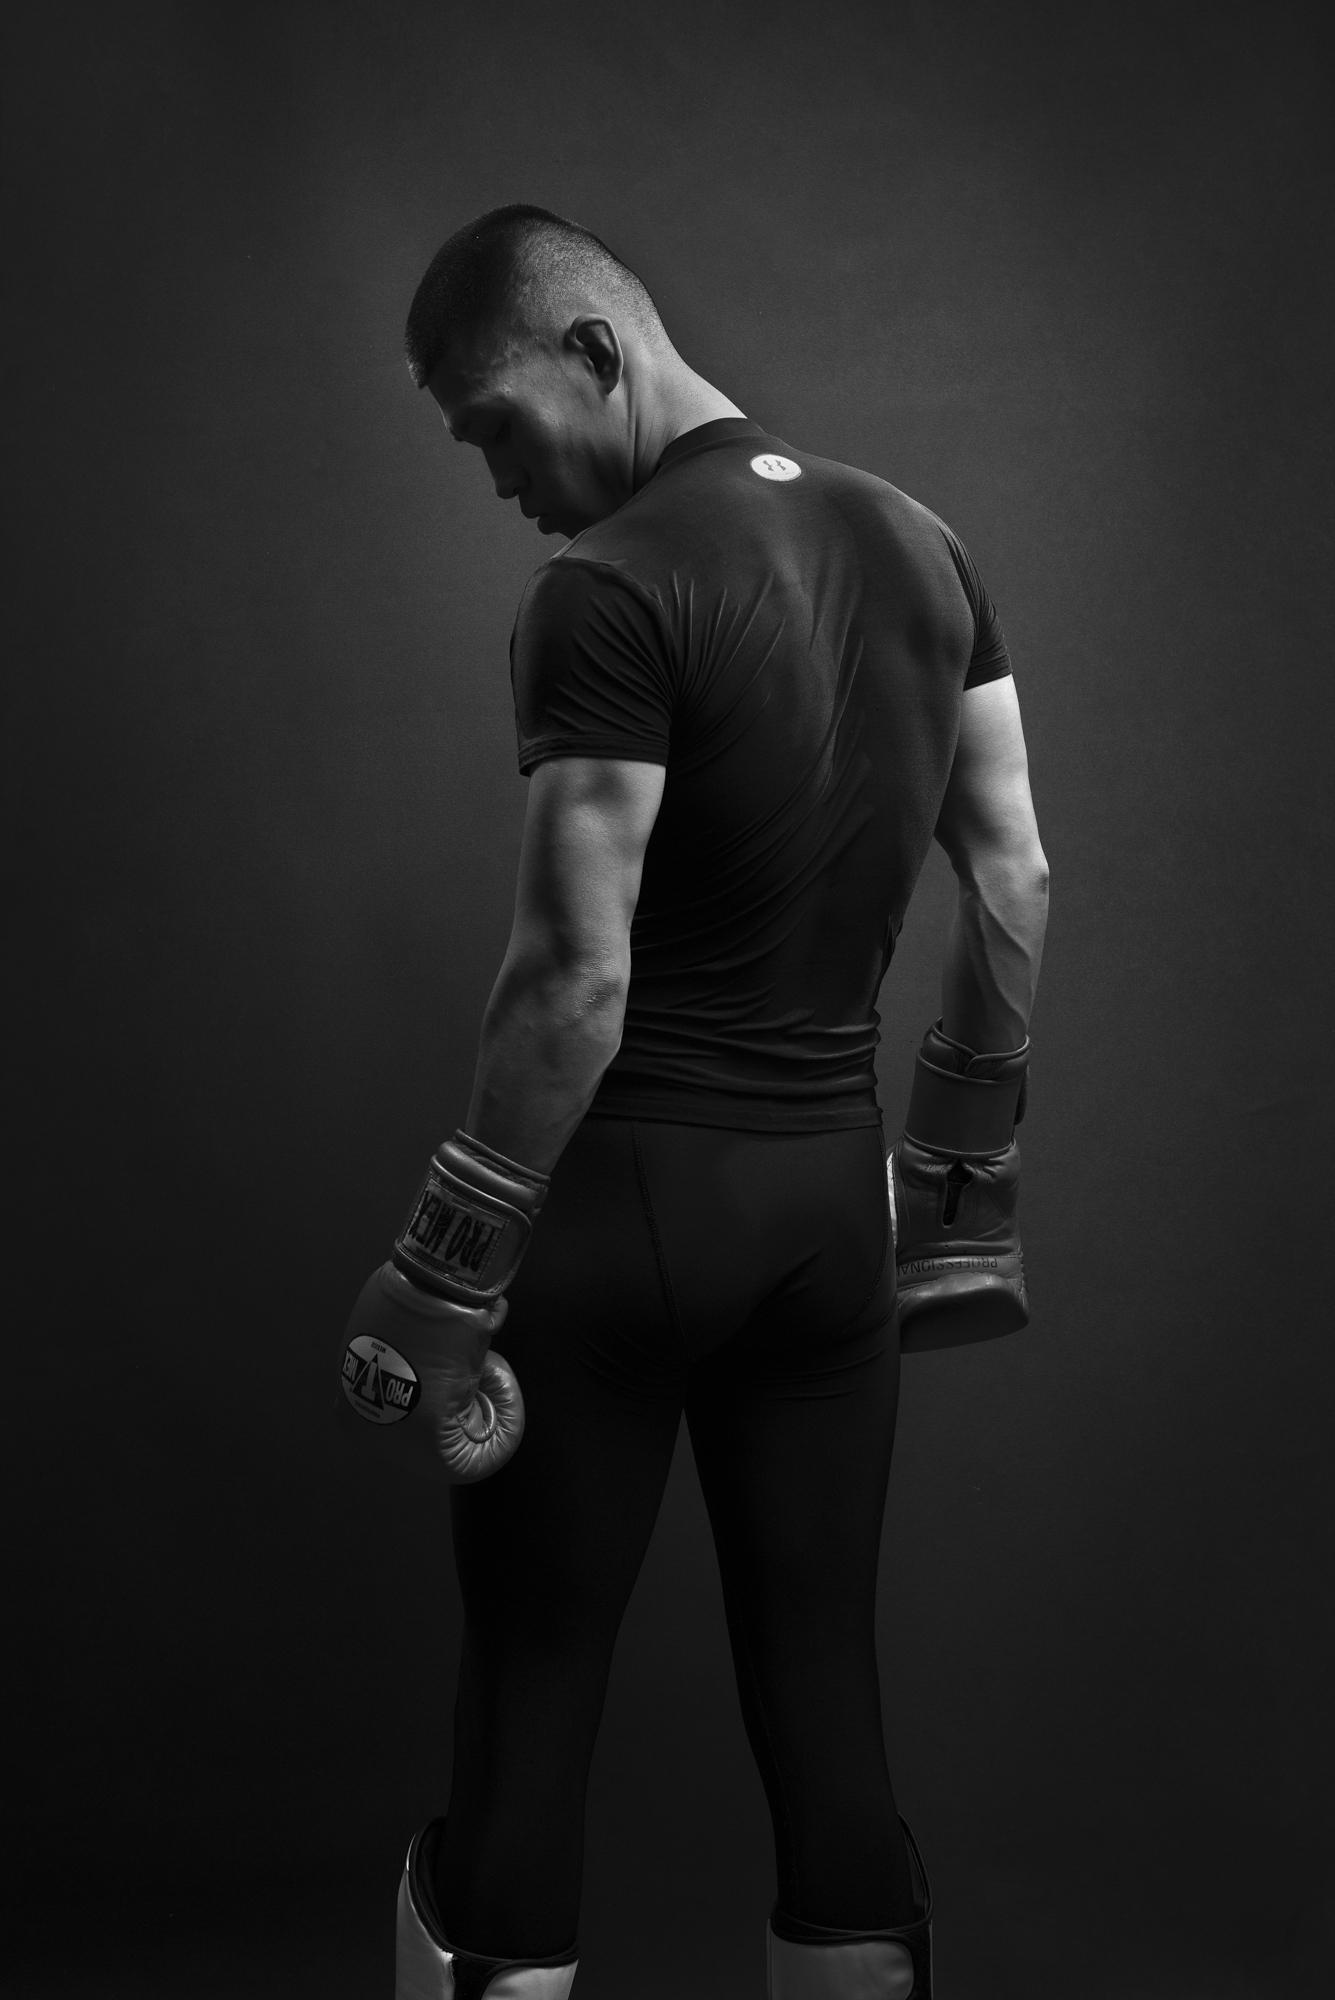 Andy_Genesis_MMA_Fighters_Justin_Lister-8235-Edit.jpg